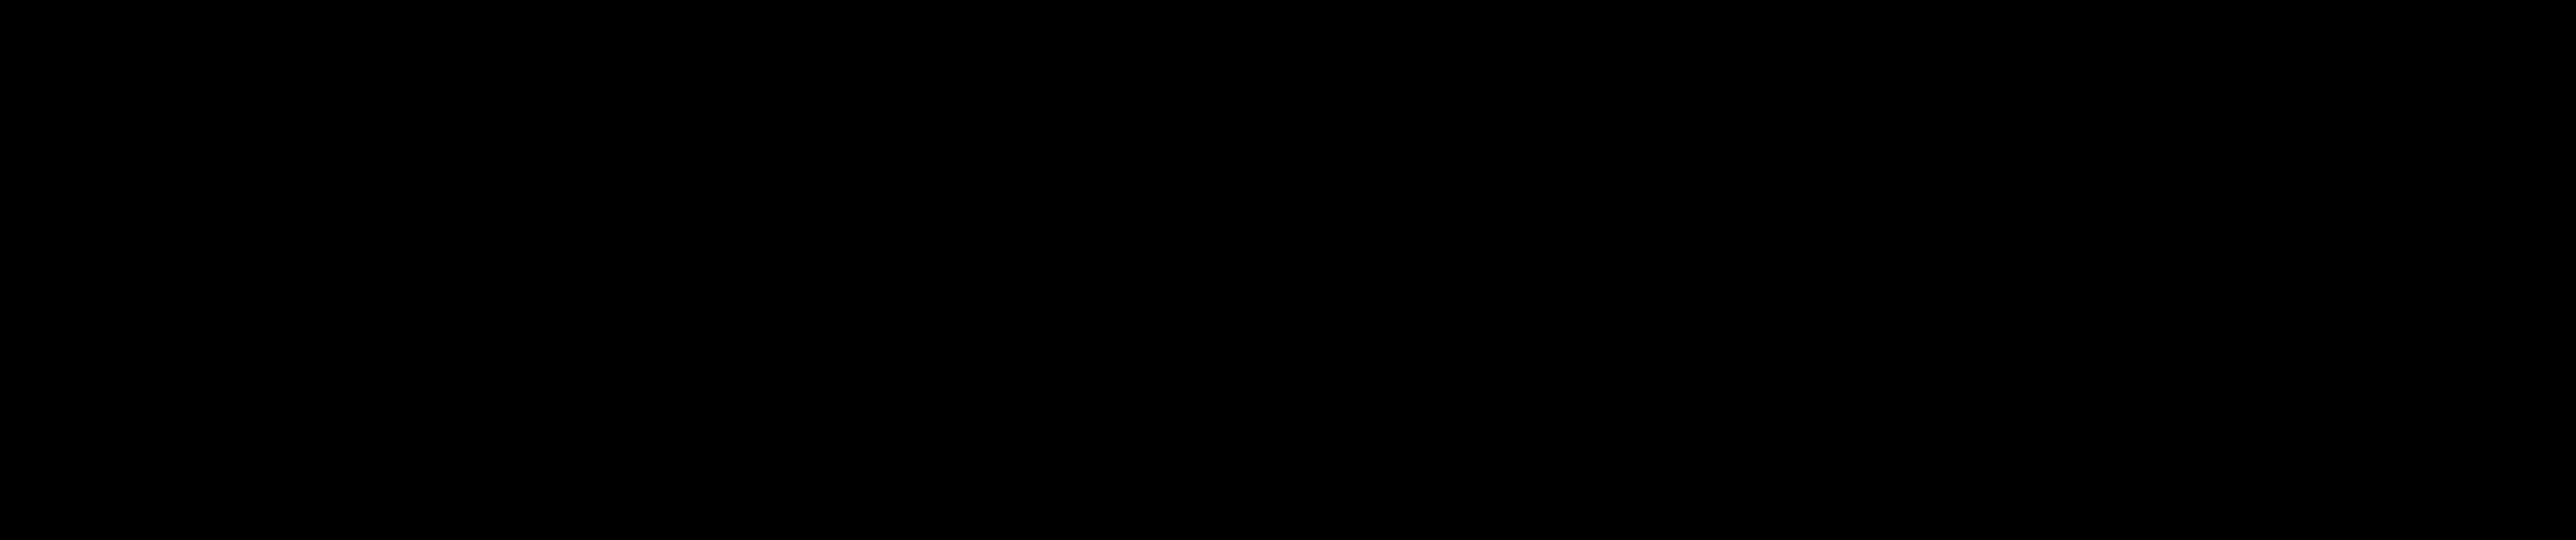 Alihankinta 2020 logo